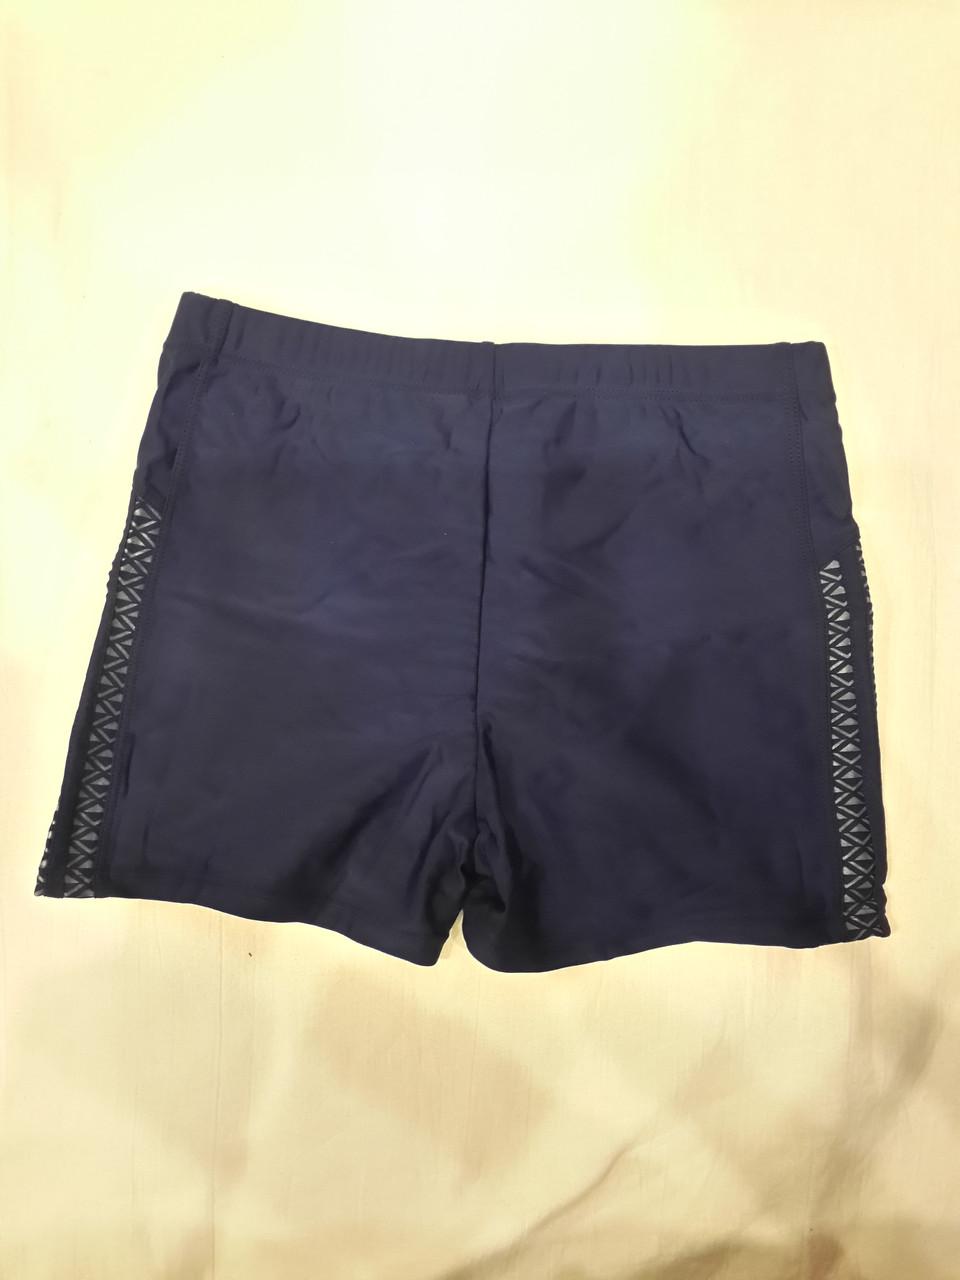 Плавки-шорты мужские 229 Эластик синие на размер 46.